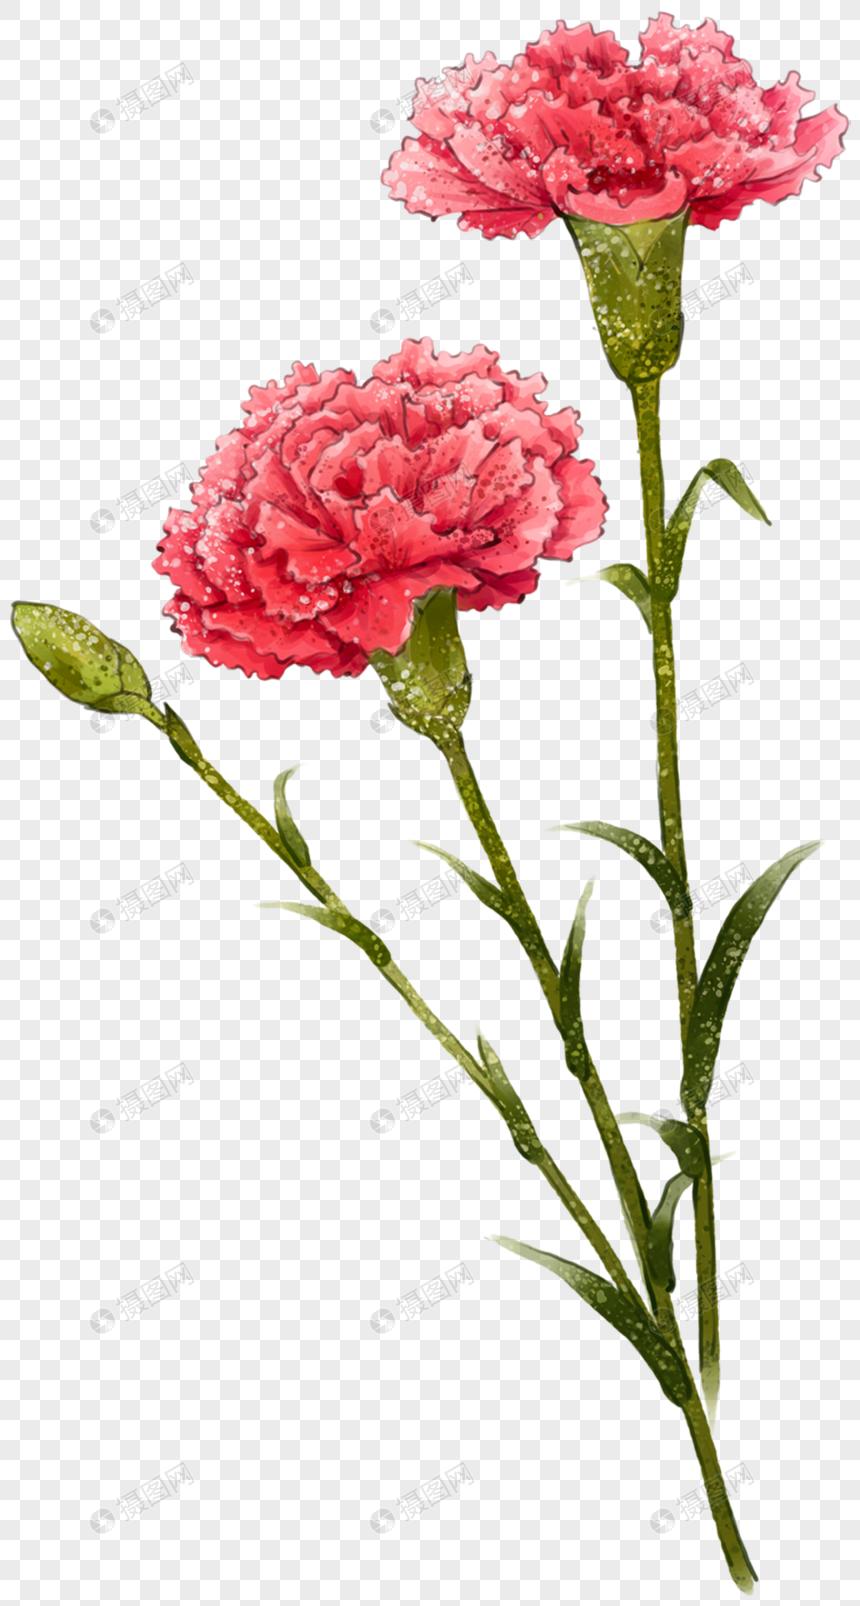 Carnation Flower Carnation Flower Carnation Flower Flower Carnation Picture Carnation Material Carnation Flower Carnations Web App Design